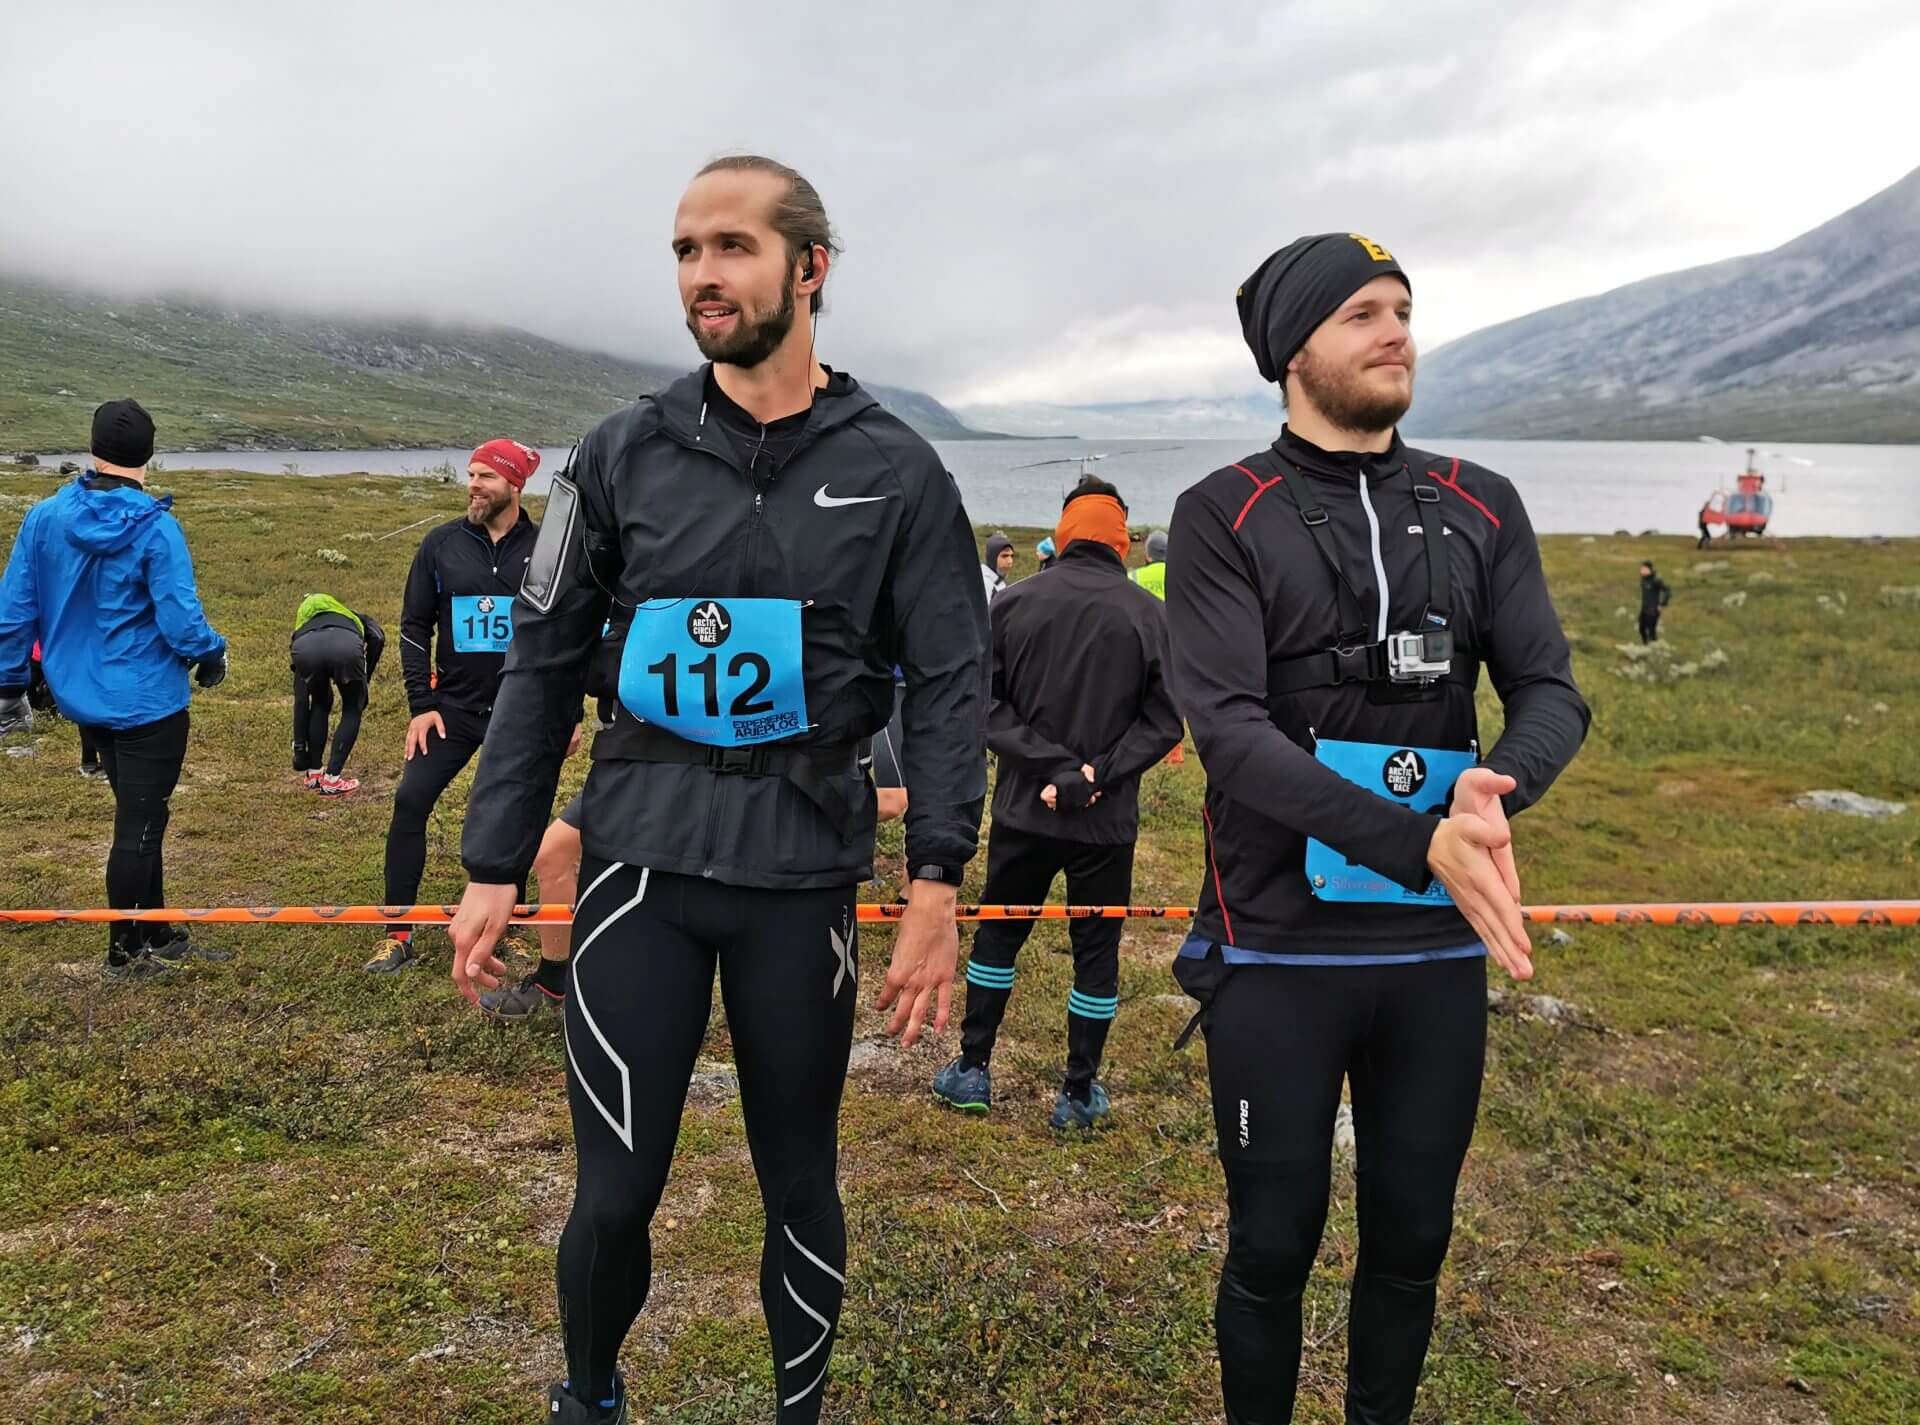 Arctic Circle Race 2019 Polcirkelloppet Guijaure start nr 112